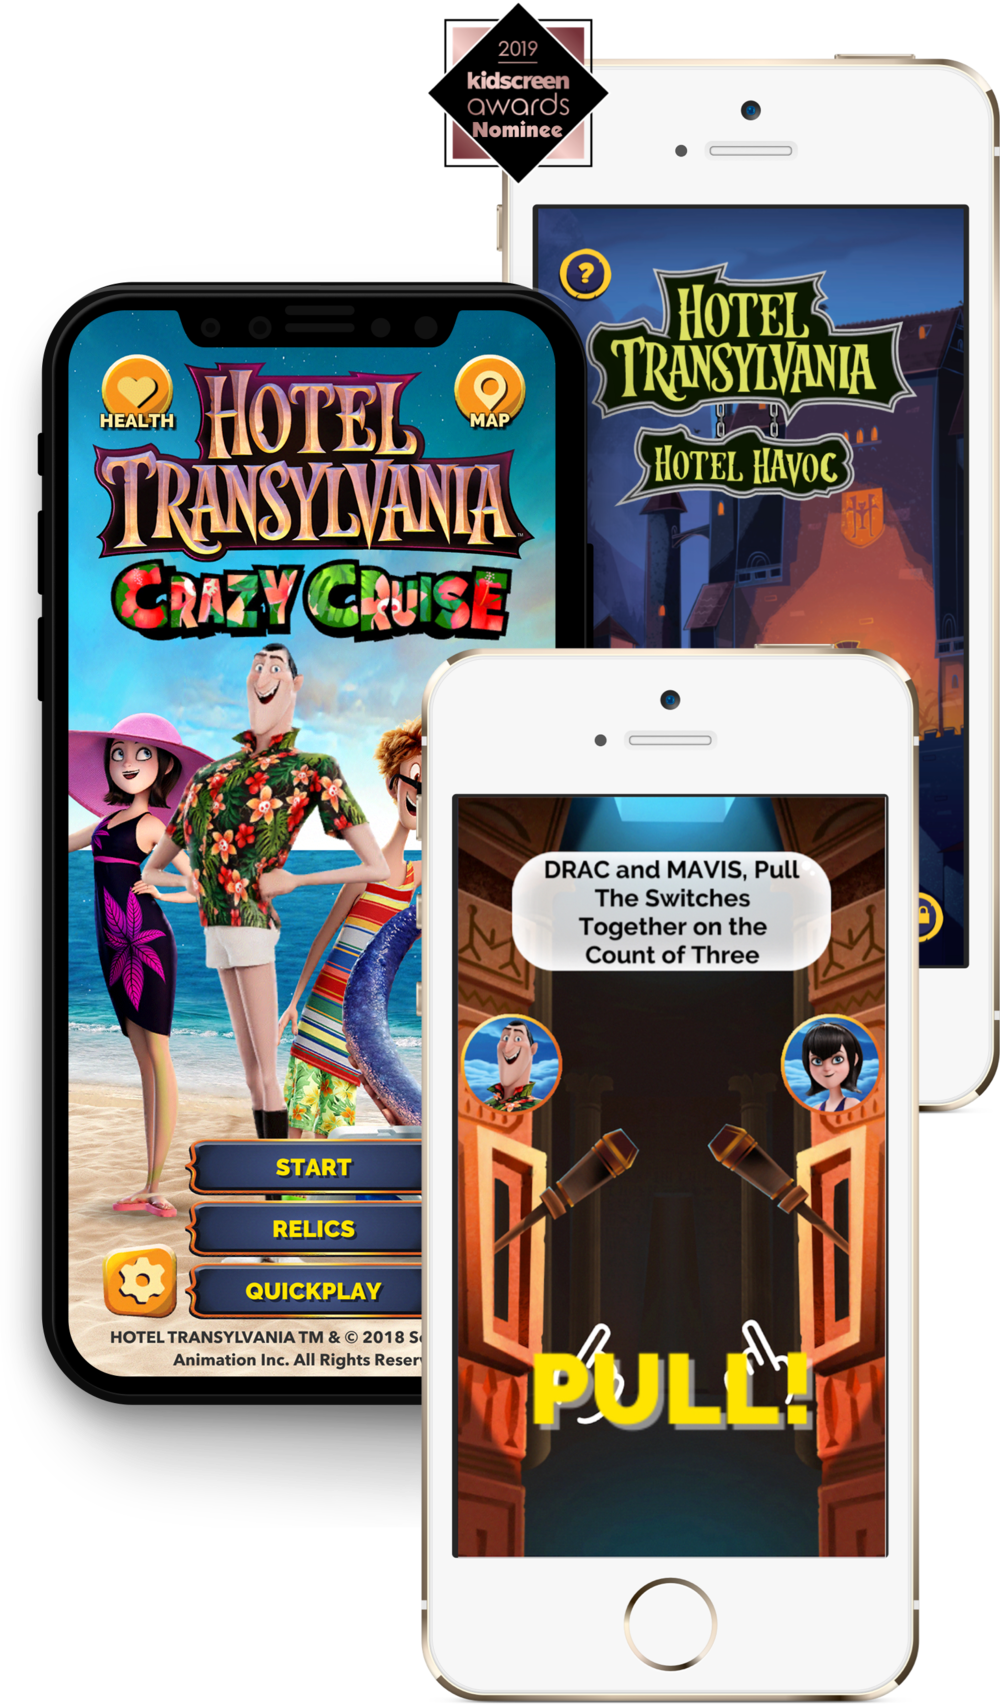 Hotel Transylvania Suite of Playground Games